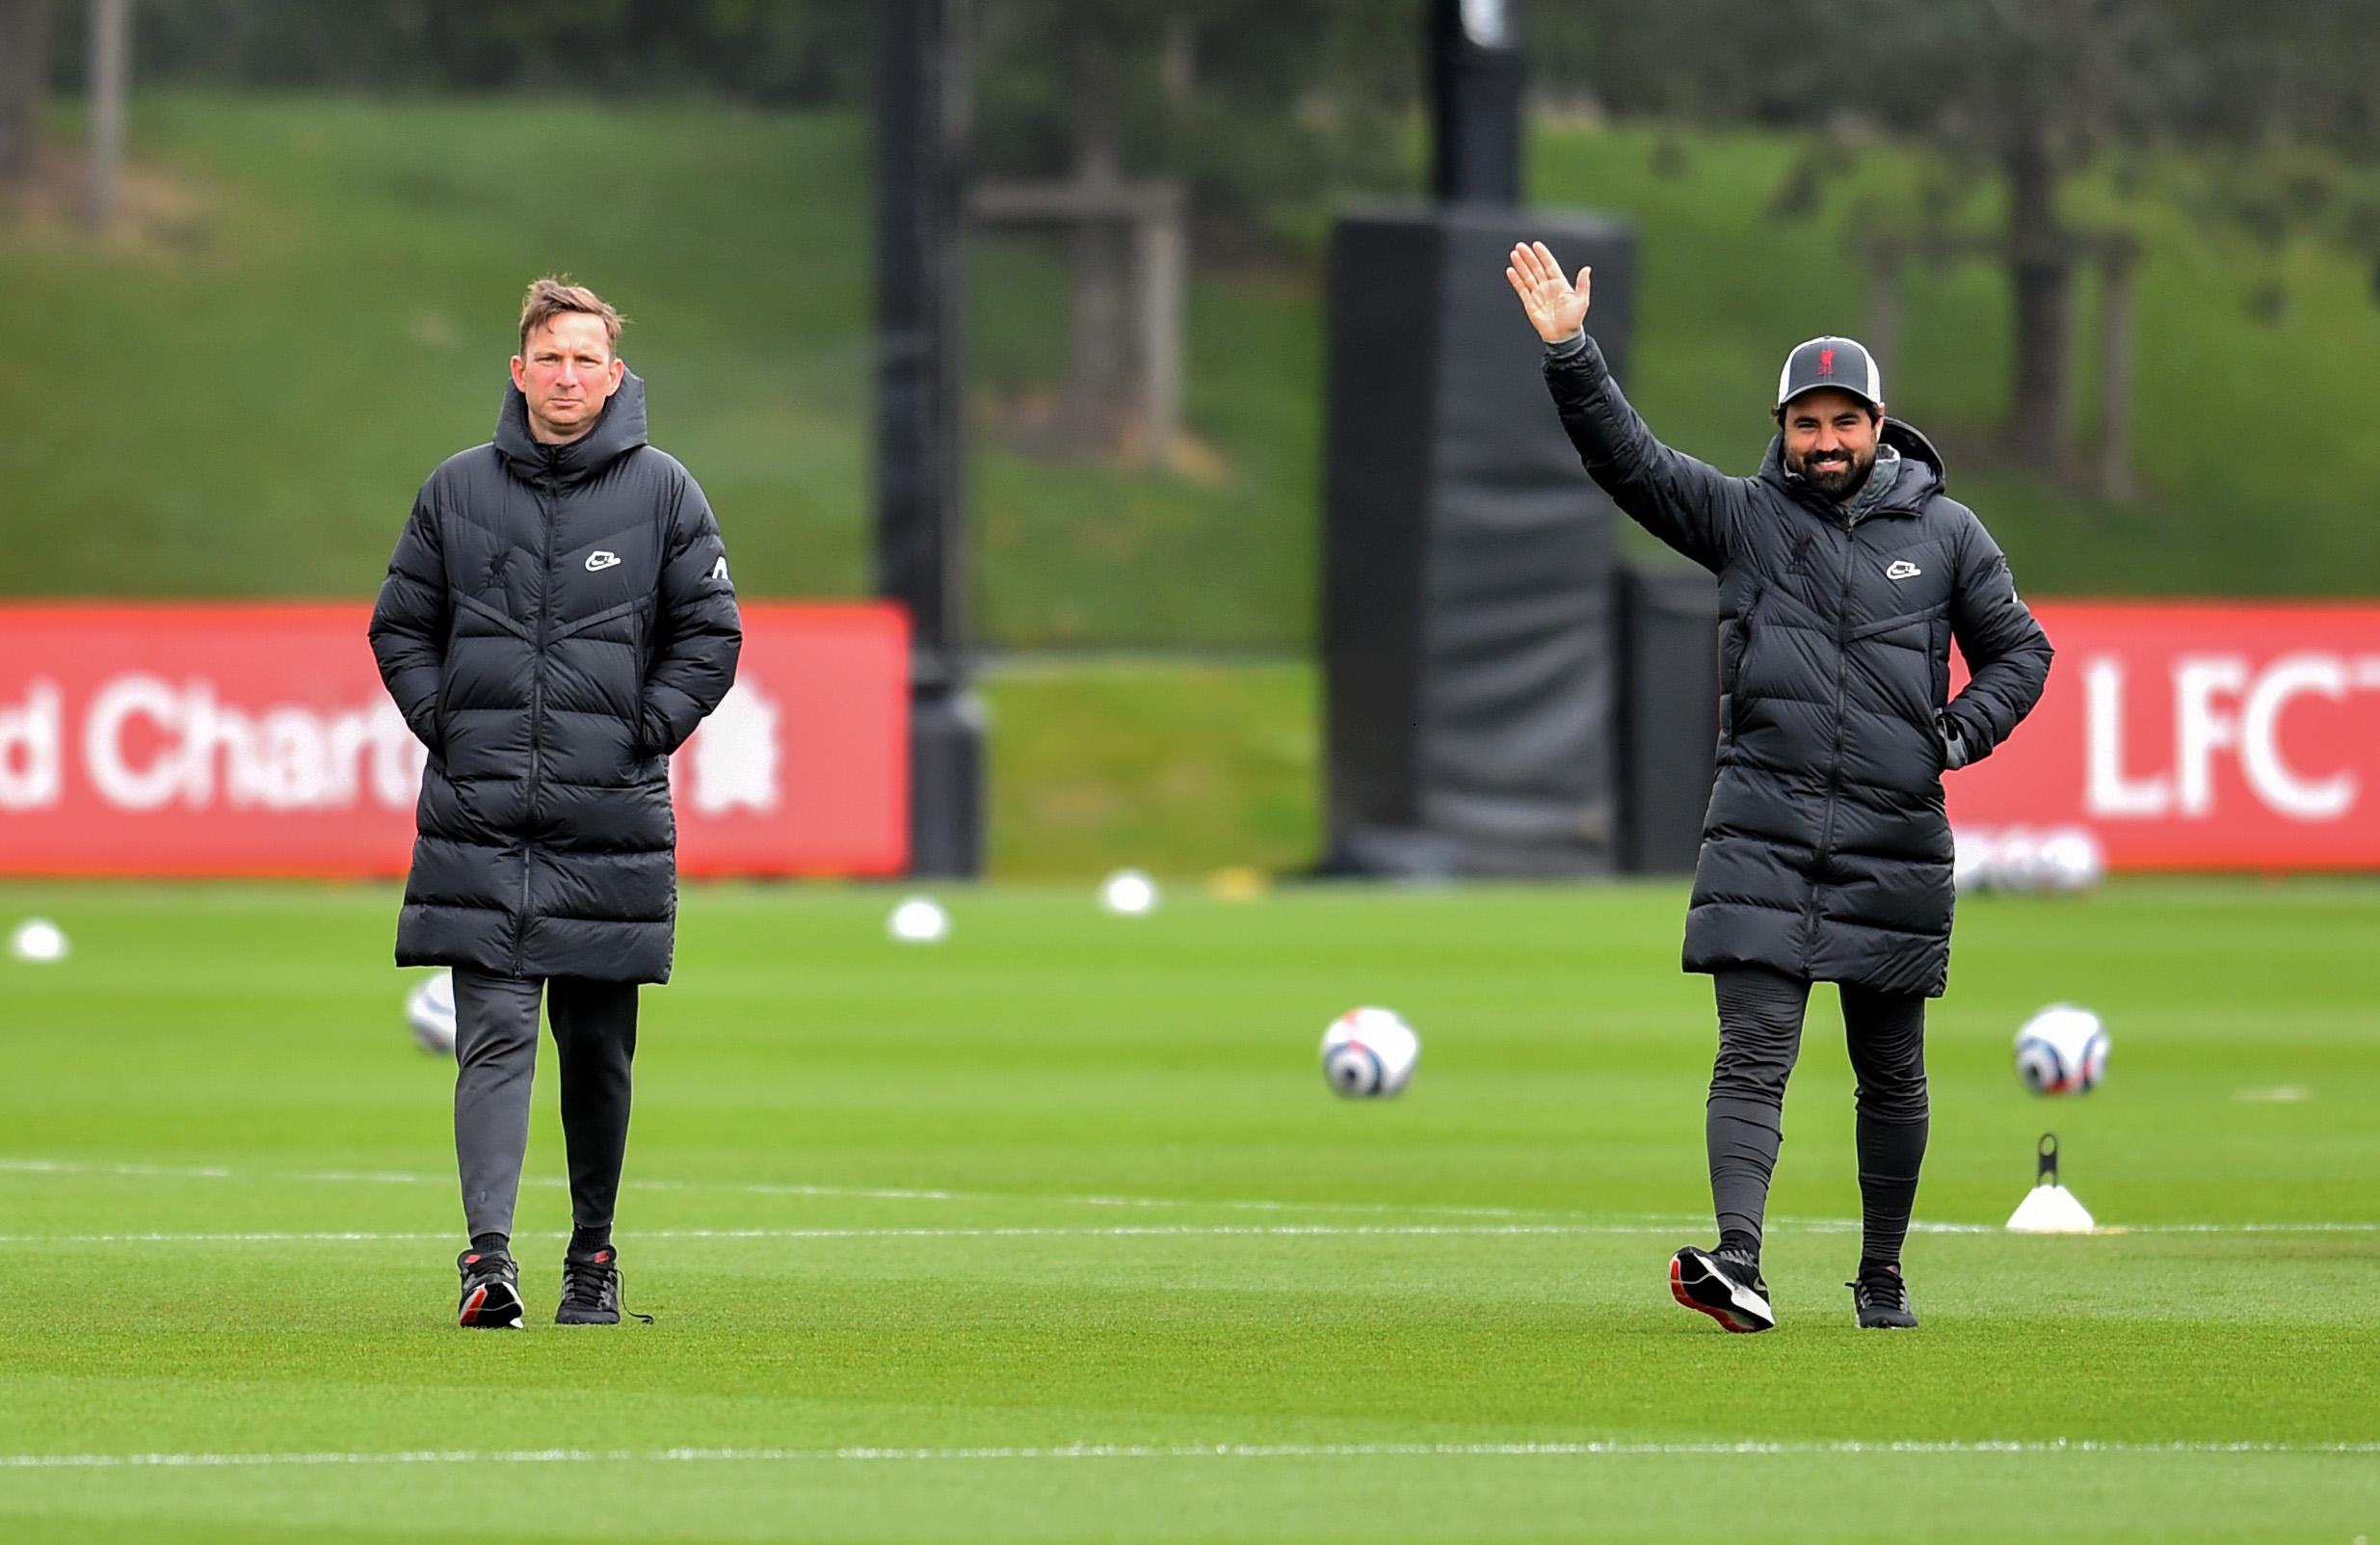 Pep Lijnders and Vitor Matos, Liverpool's elite development coach, at the AXA Training Centre.